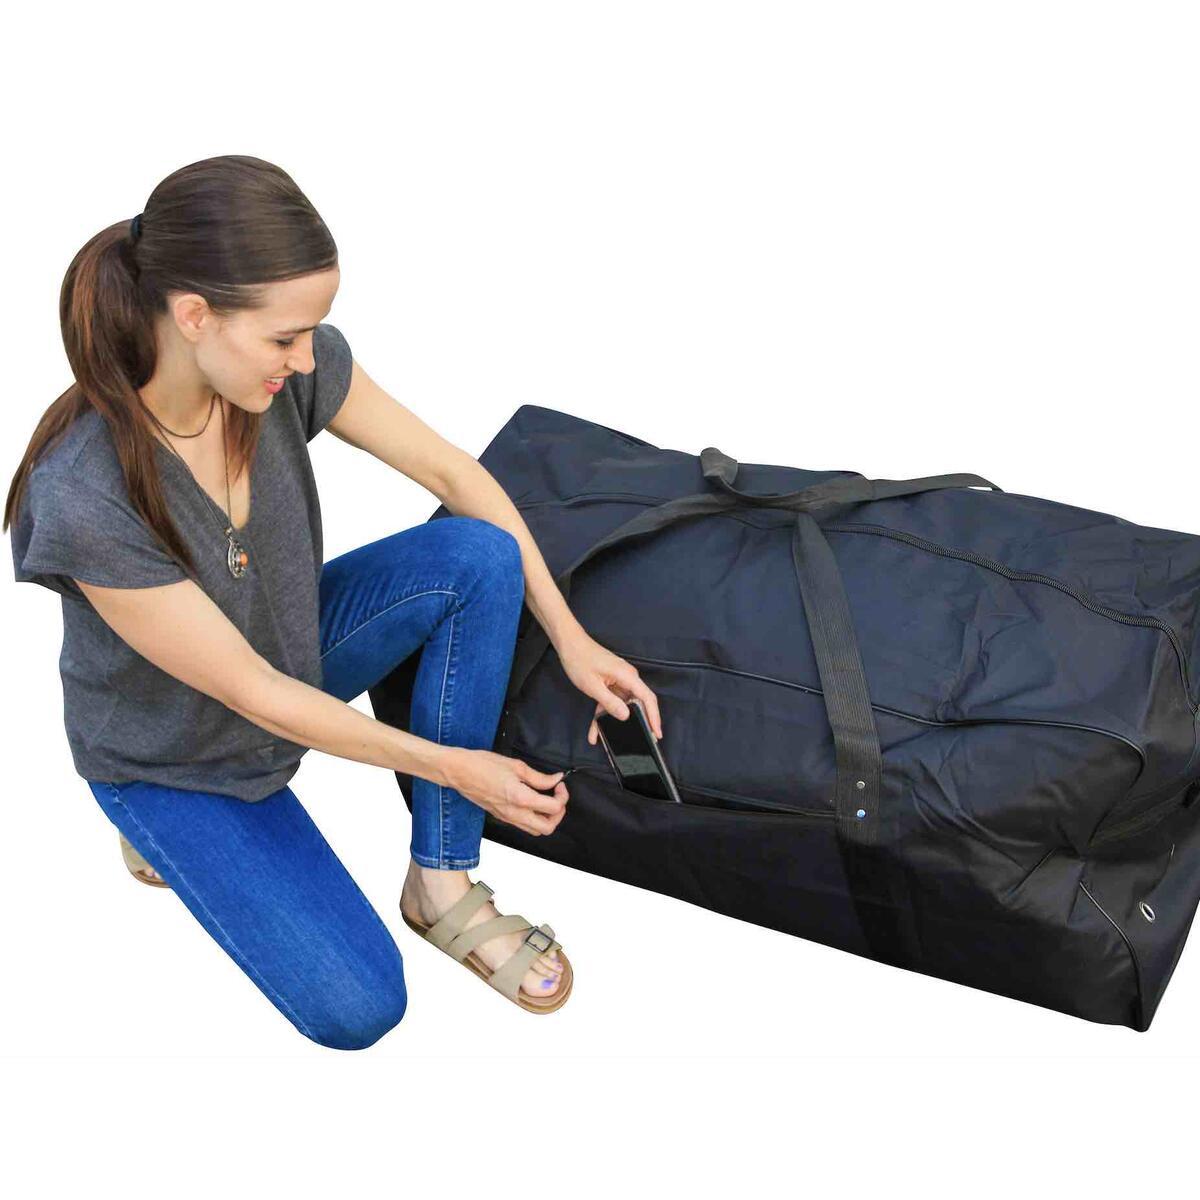 Sports Bag Boat Huge Storage Duffle Bag XL Duffle Bag Luggage Bag Gothamite 50-inch Oversized Duffle Bag Heavy Duty Camping Bag